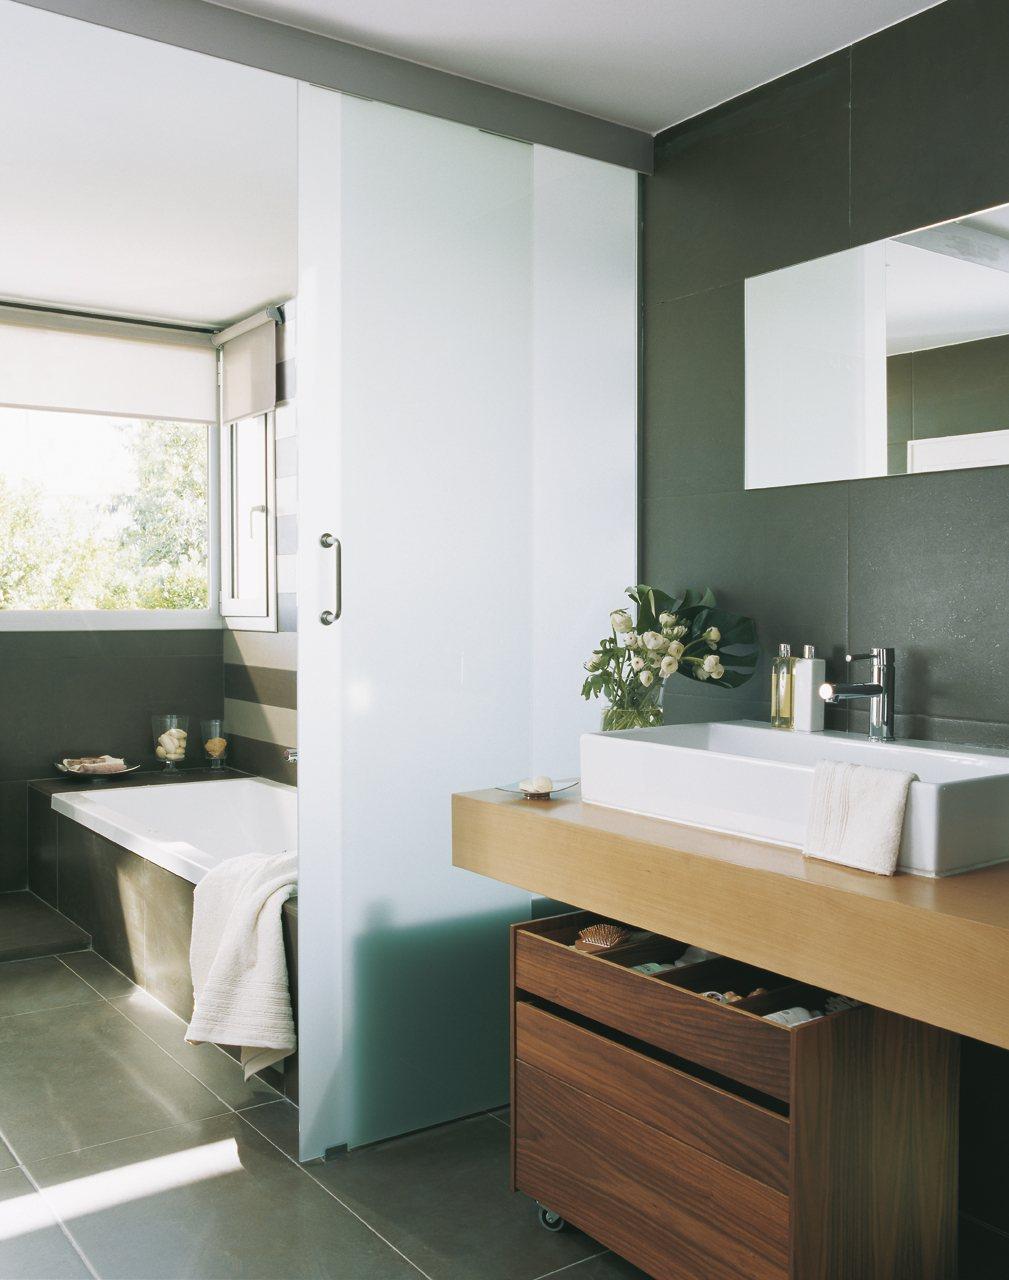 Muebles bajo lavabo a medida simple mueble bajo lavabo with muebles bajo lavabo a medida good - Muebles de lavabo a medida ...